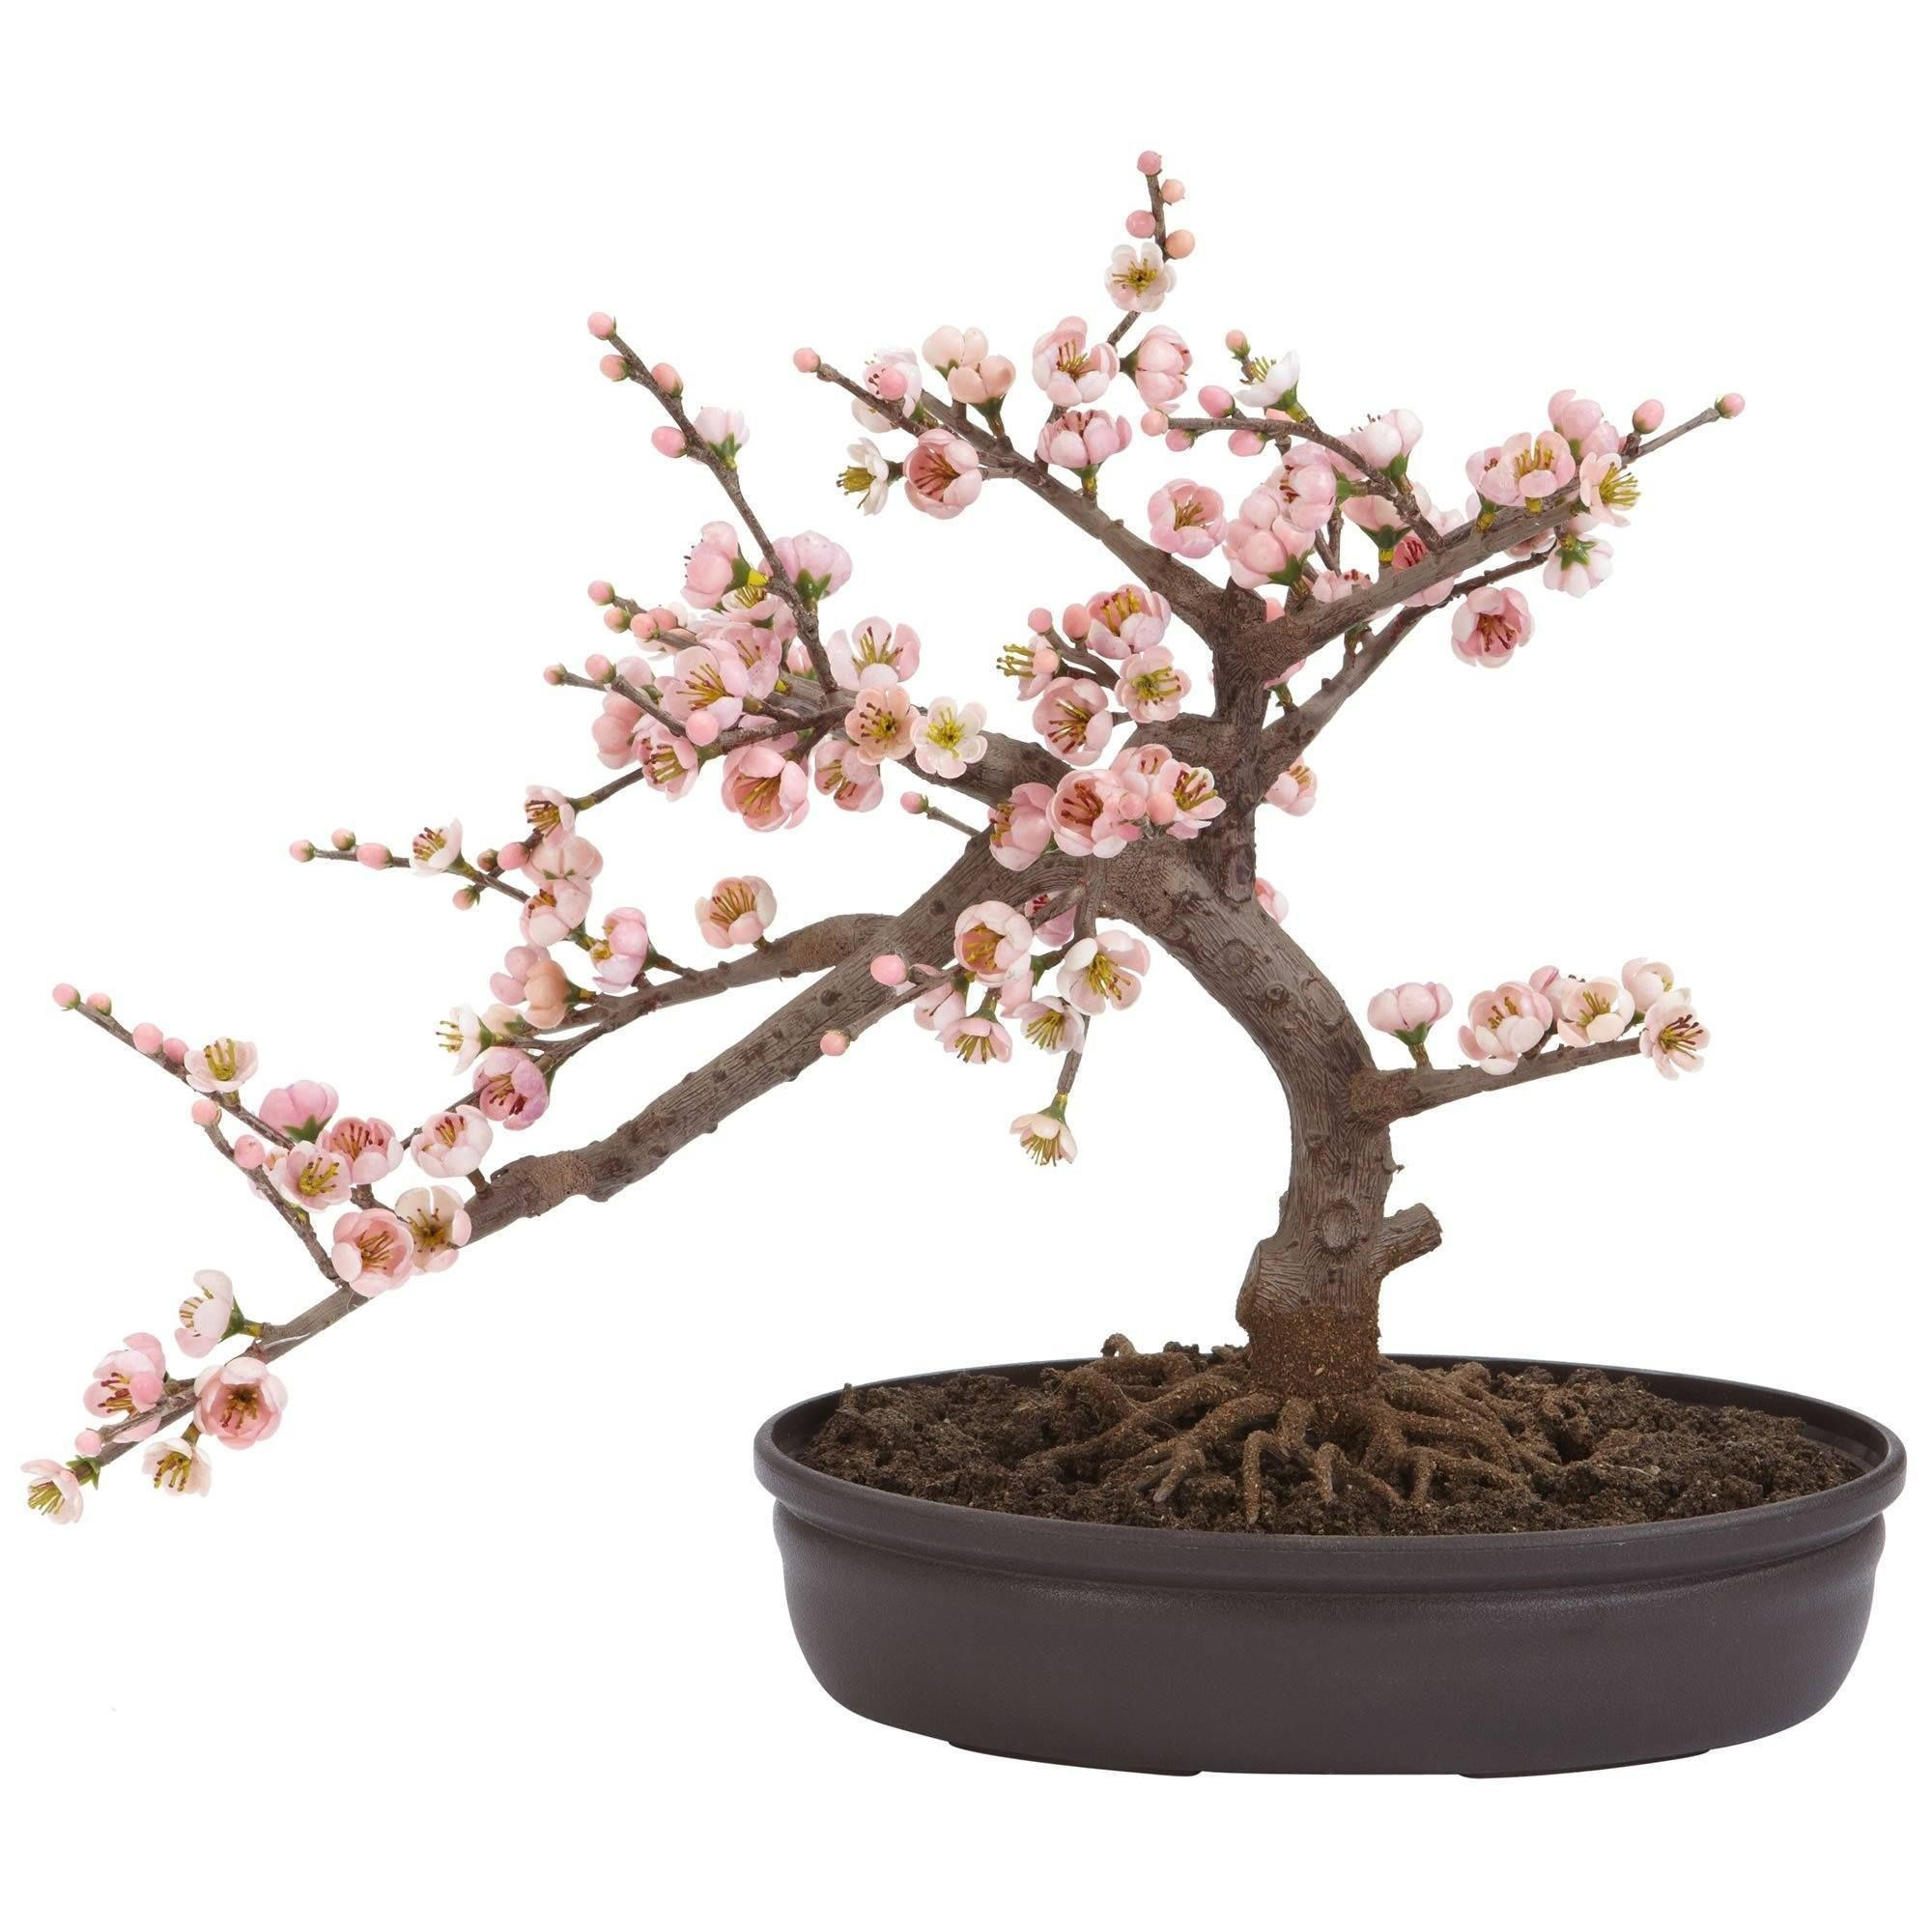 Cherry Blossom Bonsai Silk Tree Cherry Blossom Bonsai Tree Cherry Blossom Tree Blossom Trees